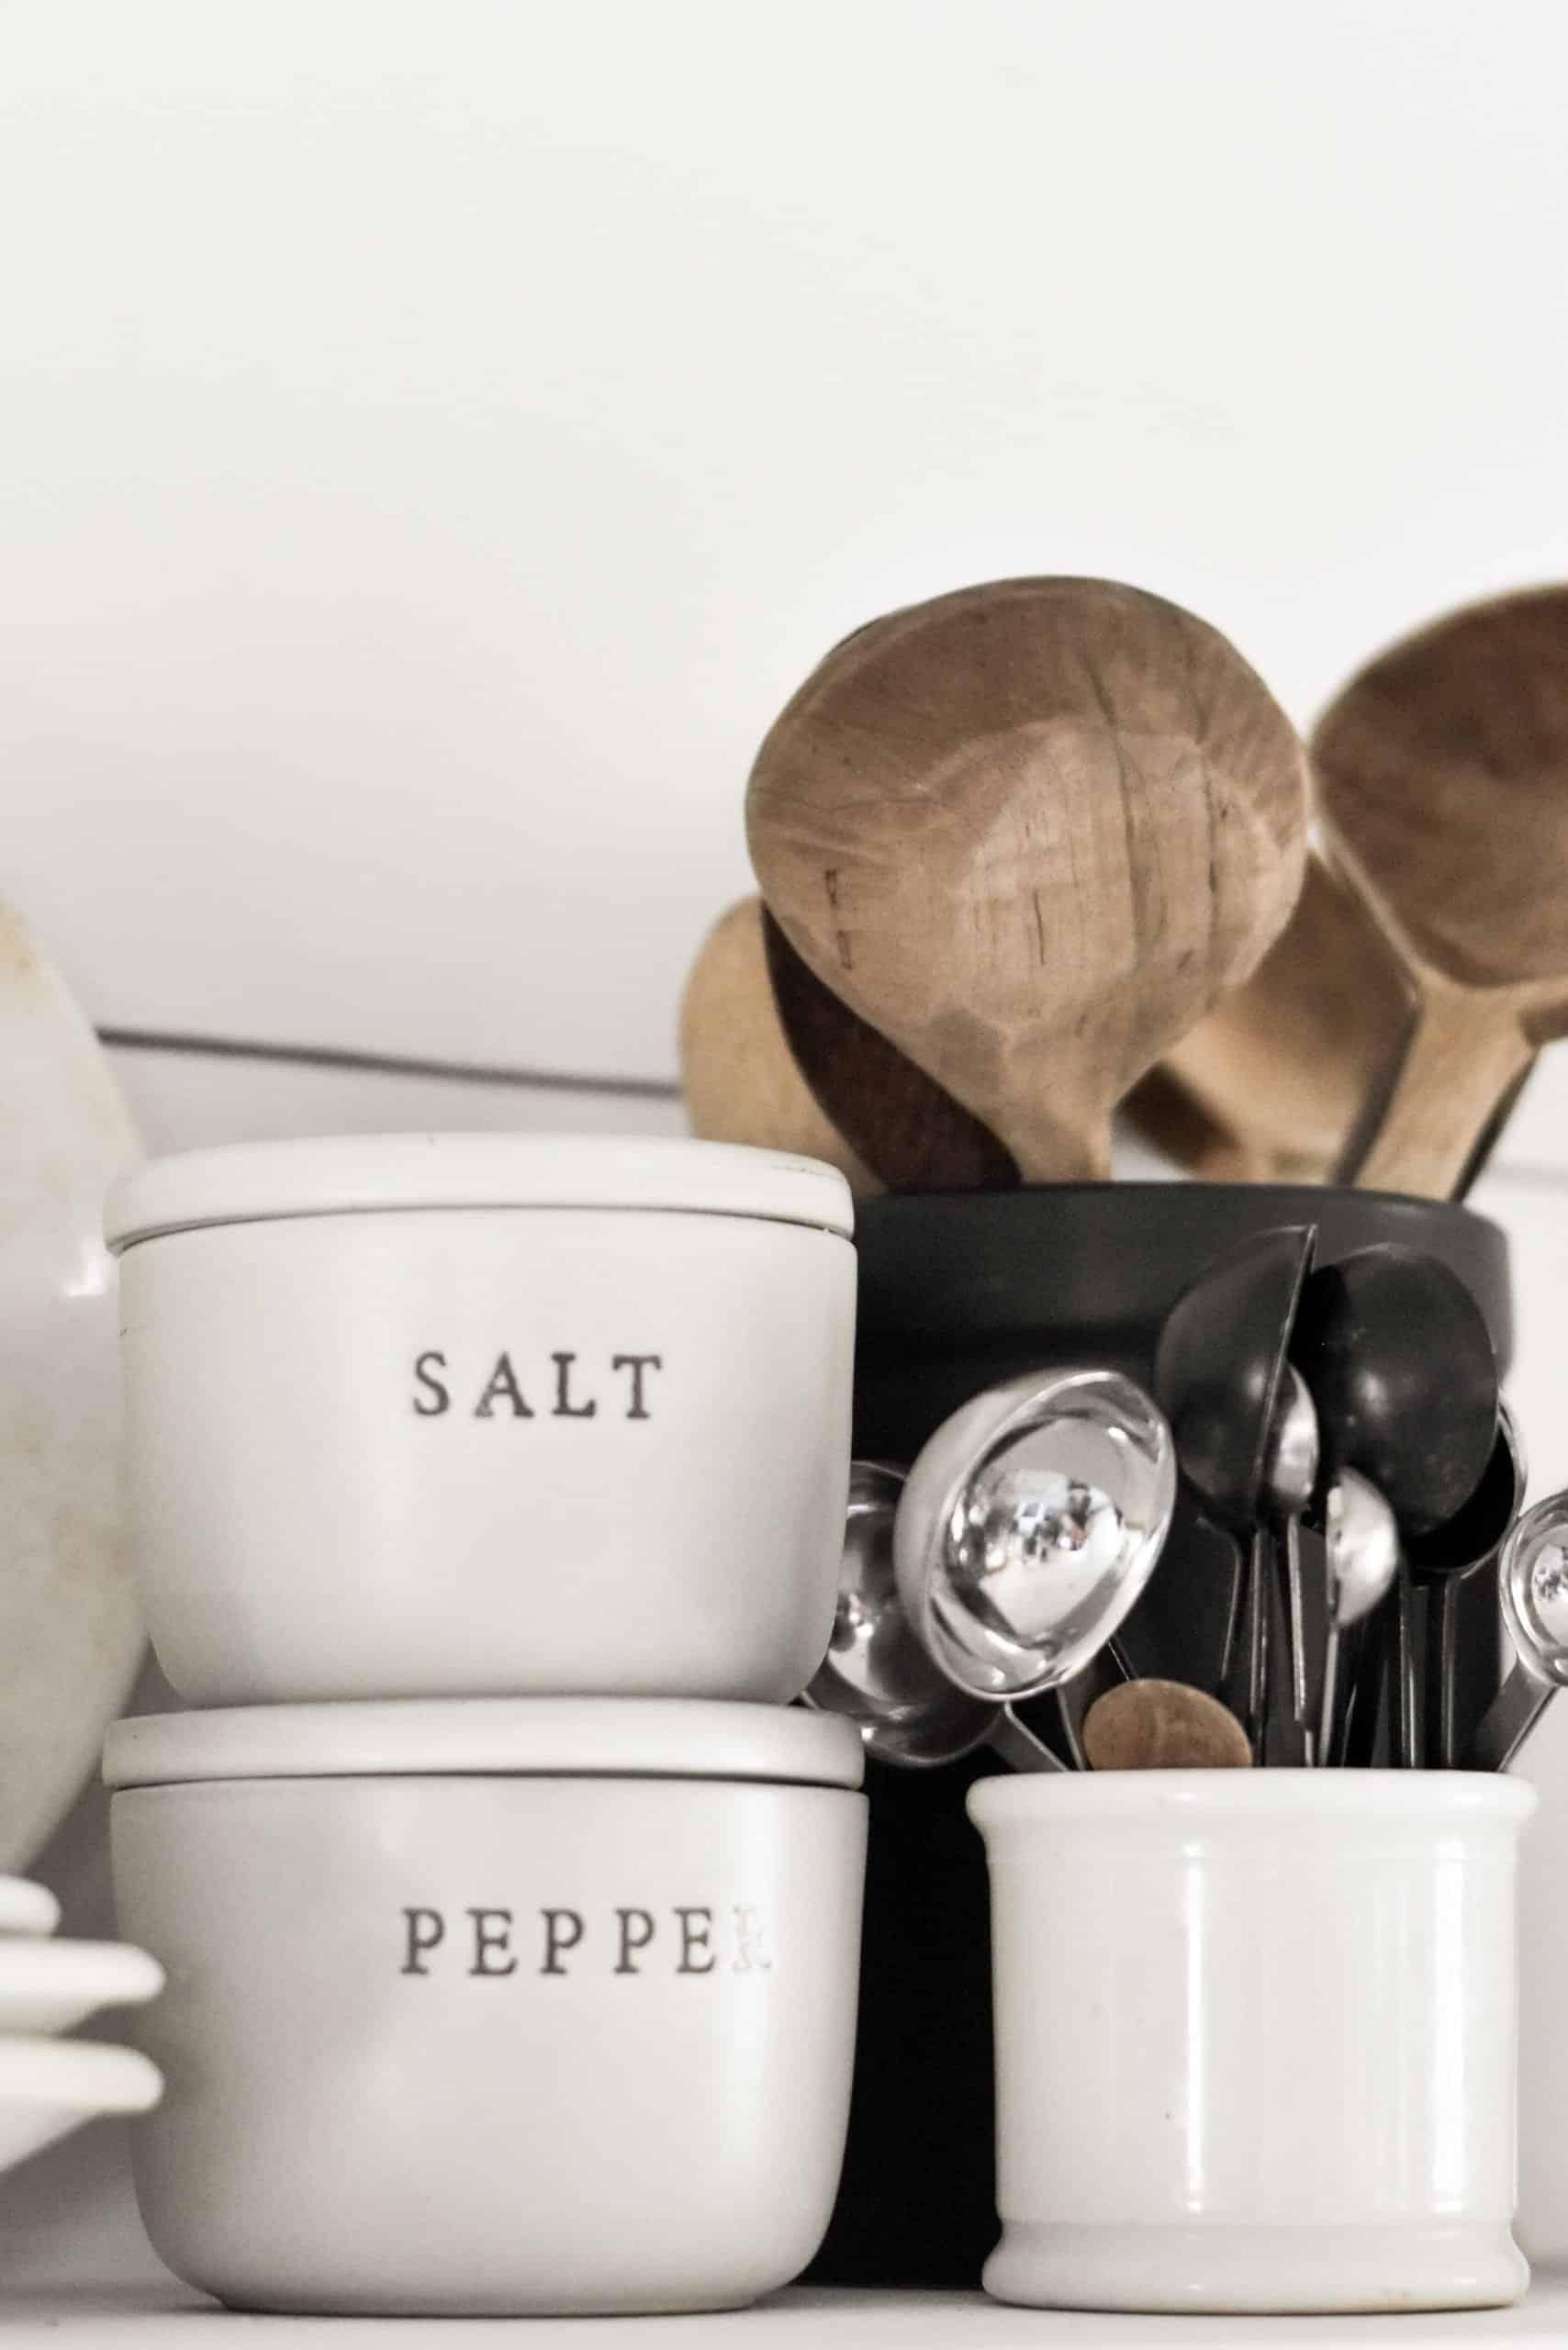 Rustic Style Shelf Kitchen Organization How to Style Kitchen Shelves